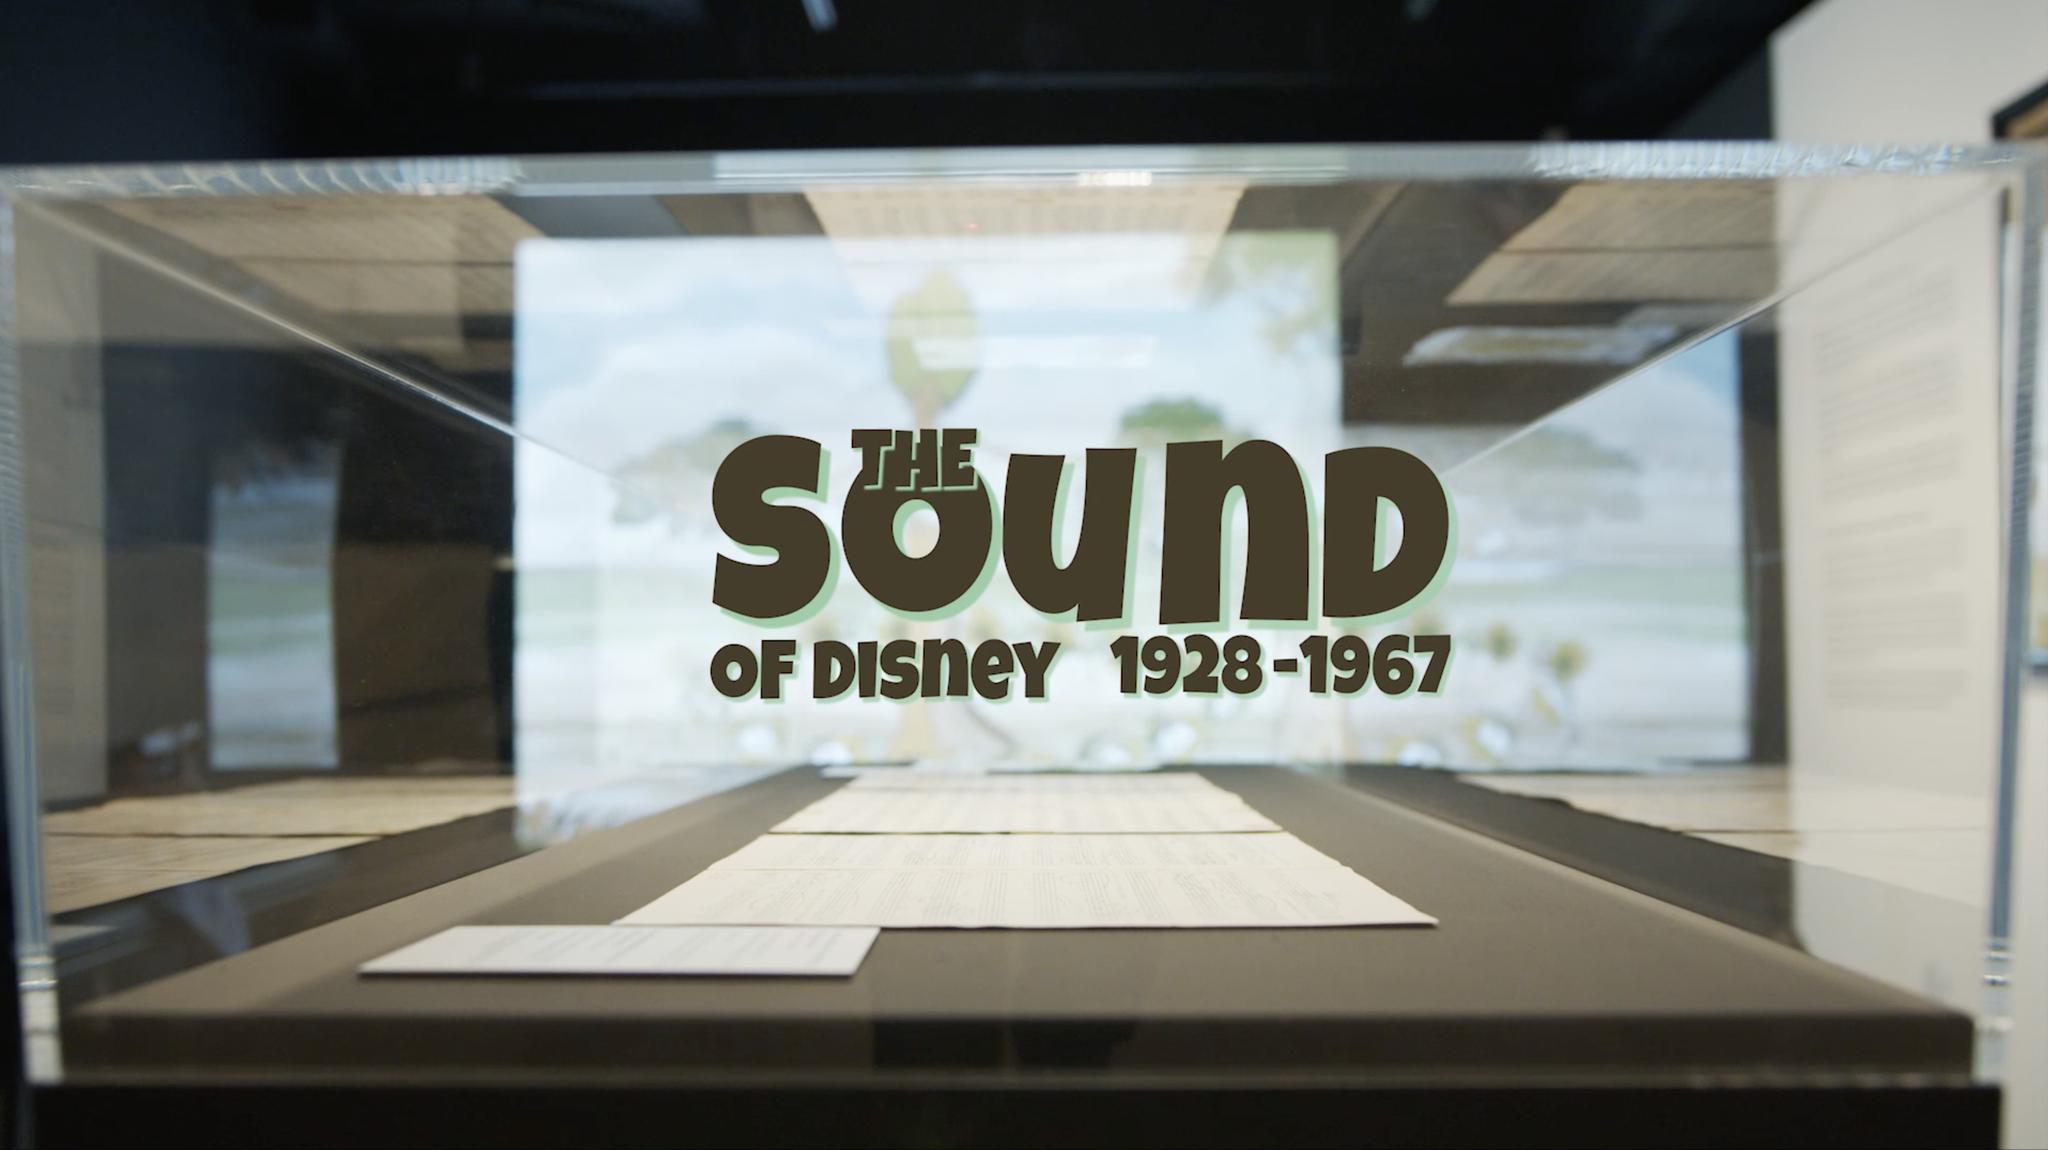 The Sound Of Disney (2020) Director: Linda Gasser, Camera: Paul Becht